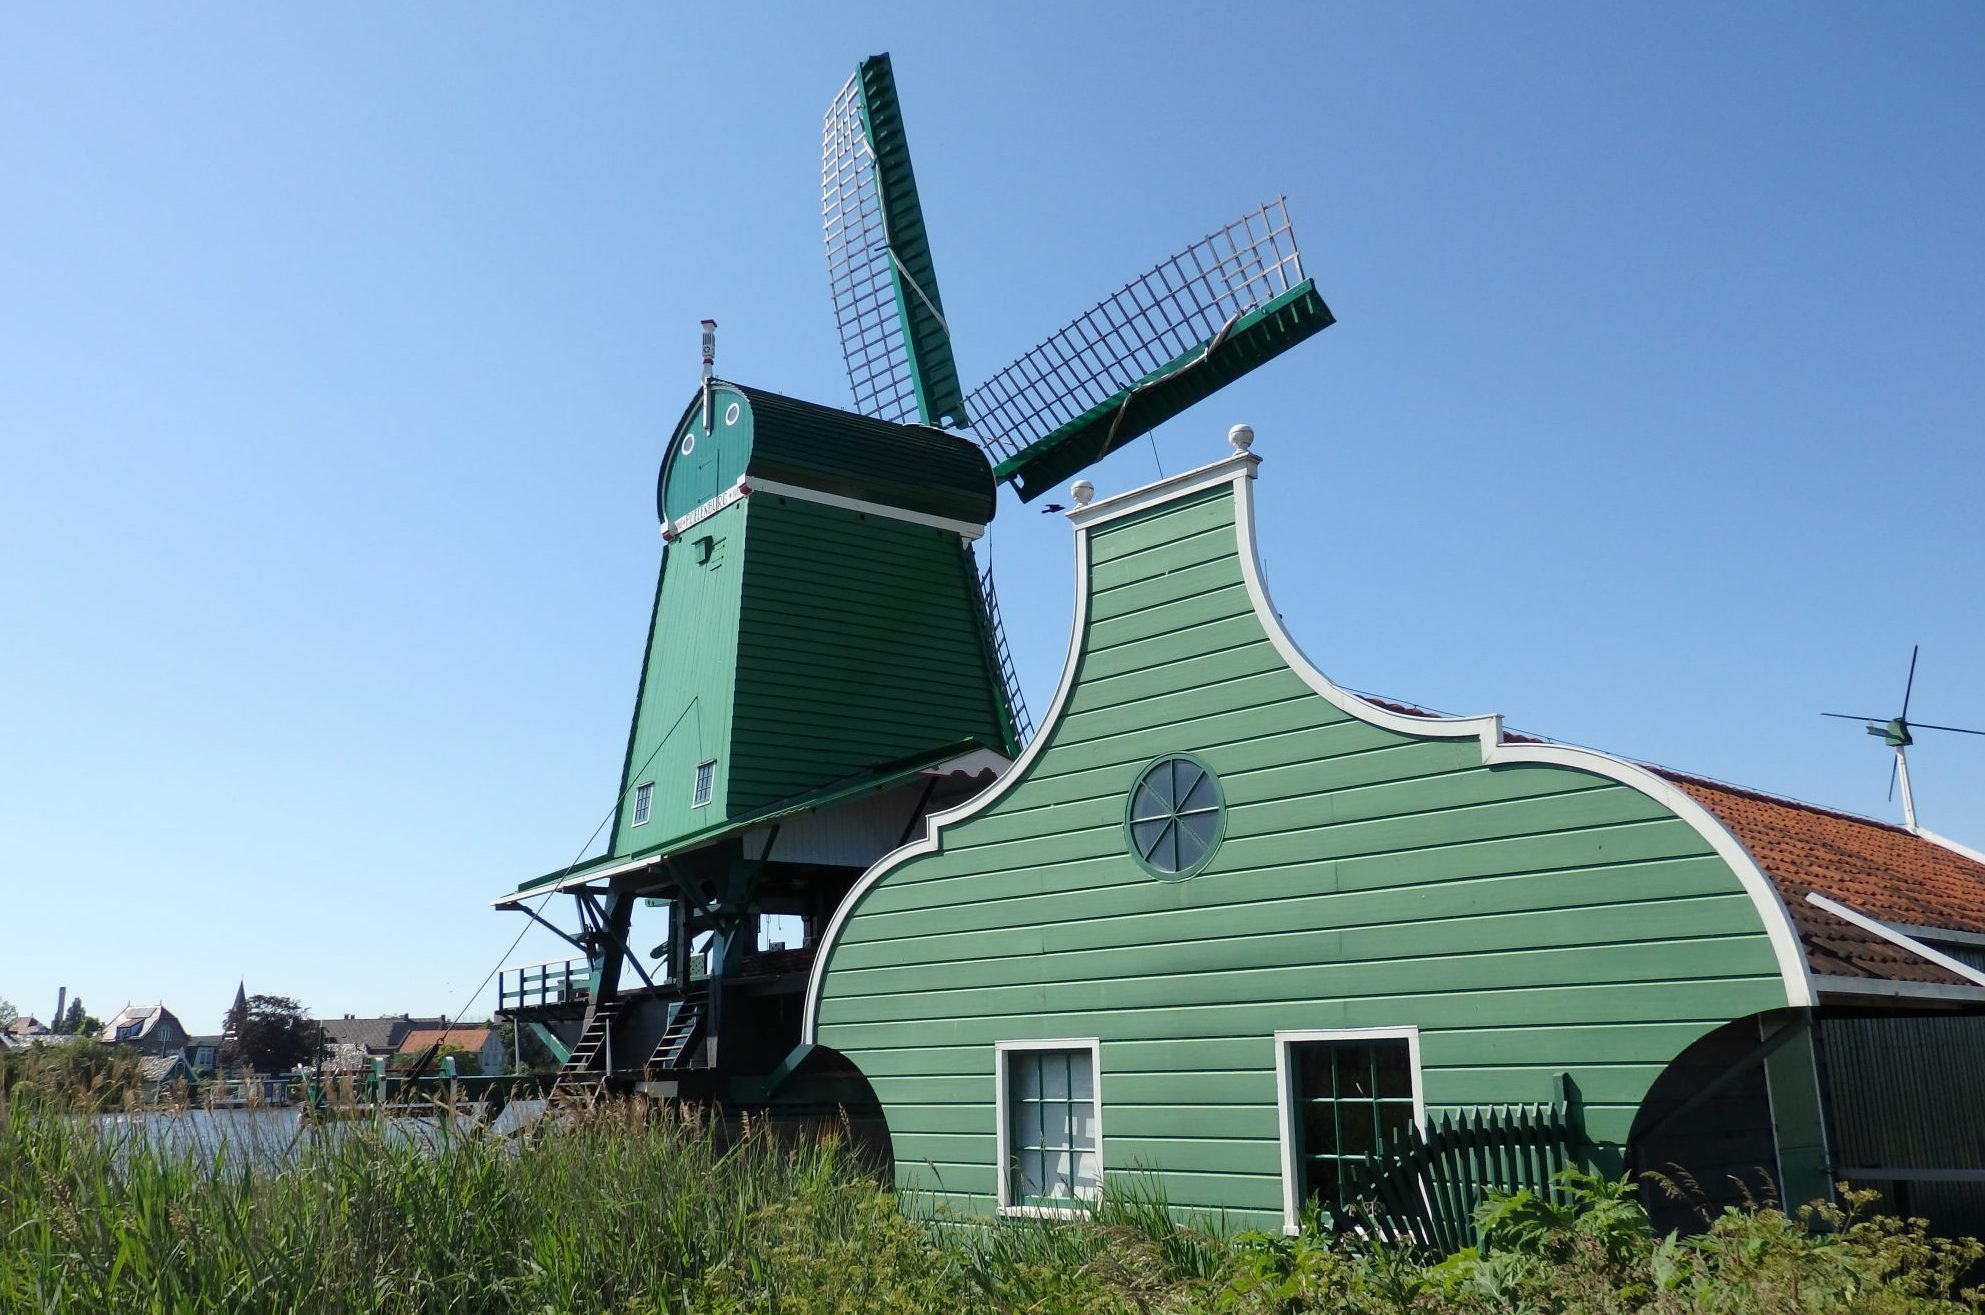 Poelenburg windmill: a sawmill at Zaanse Schans